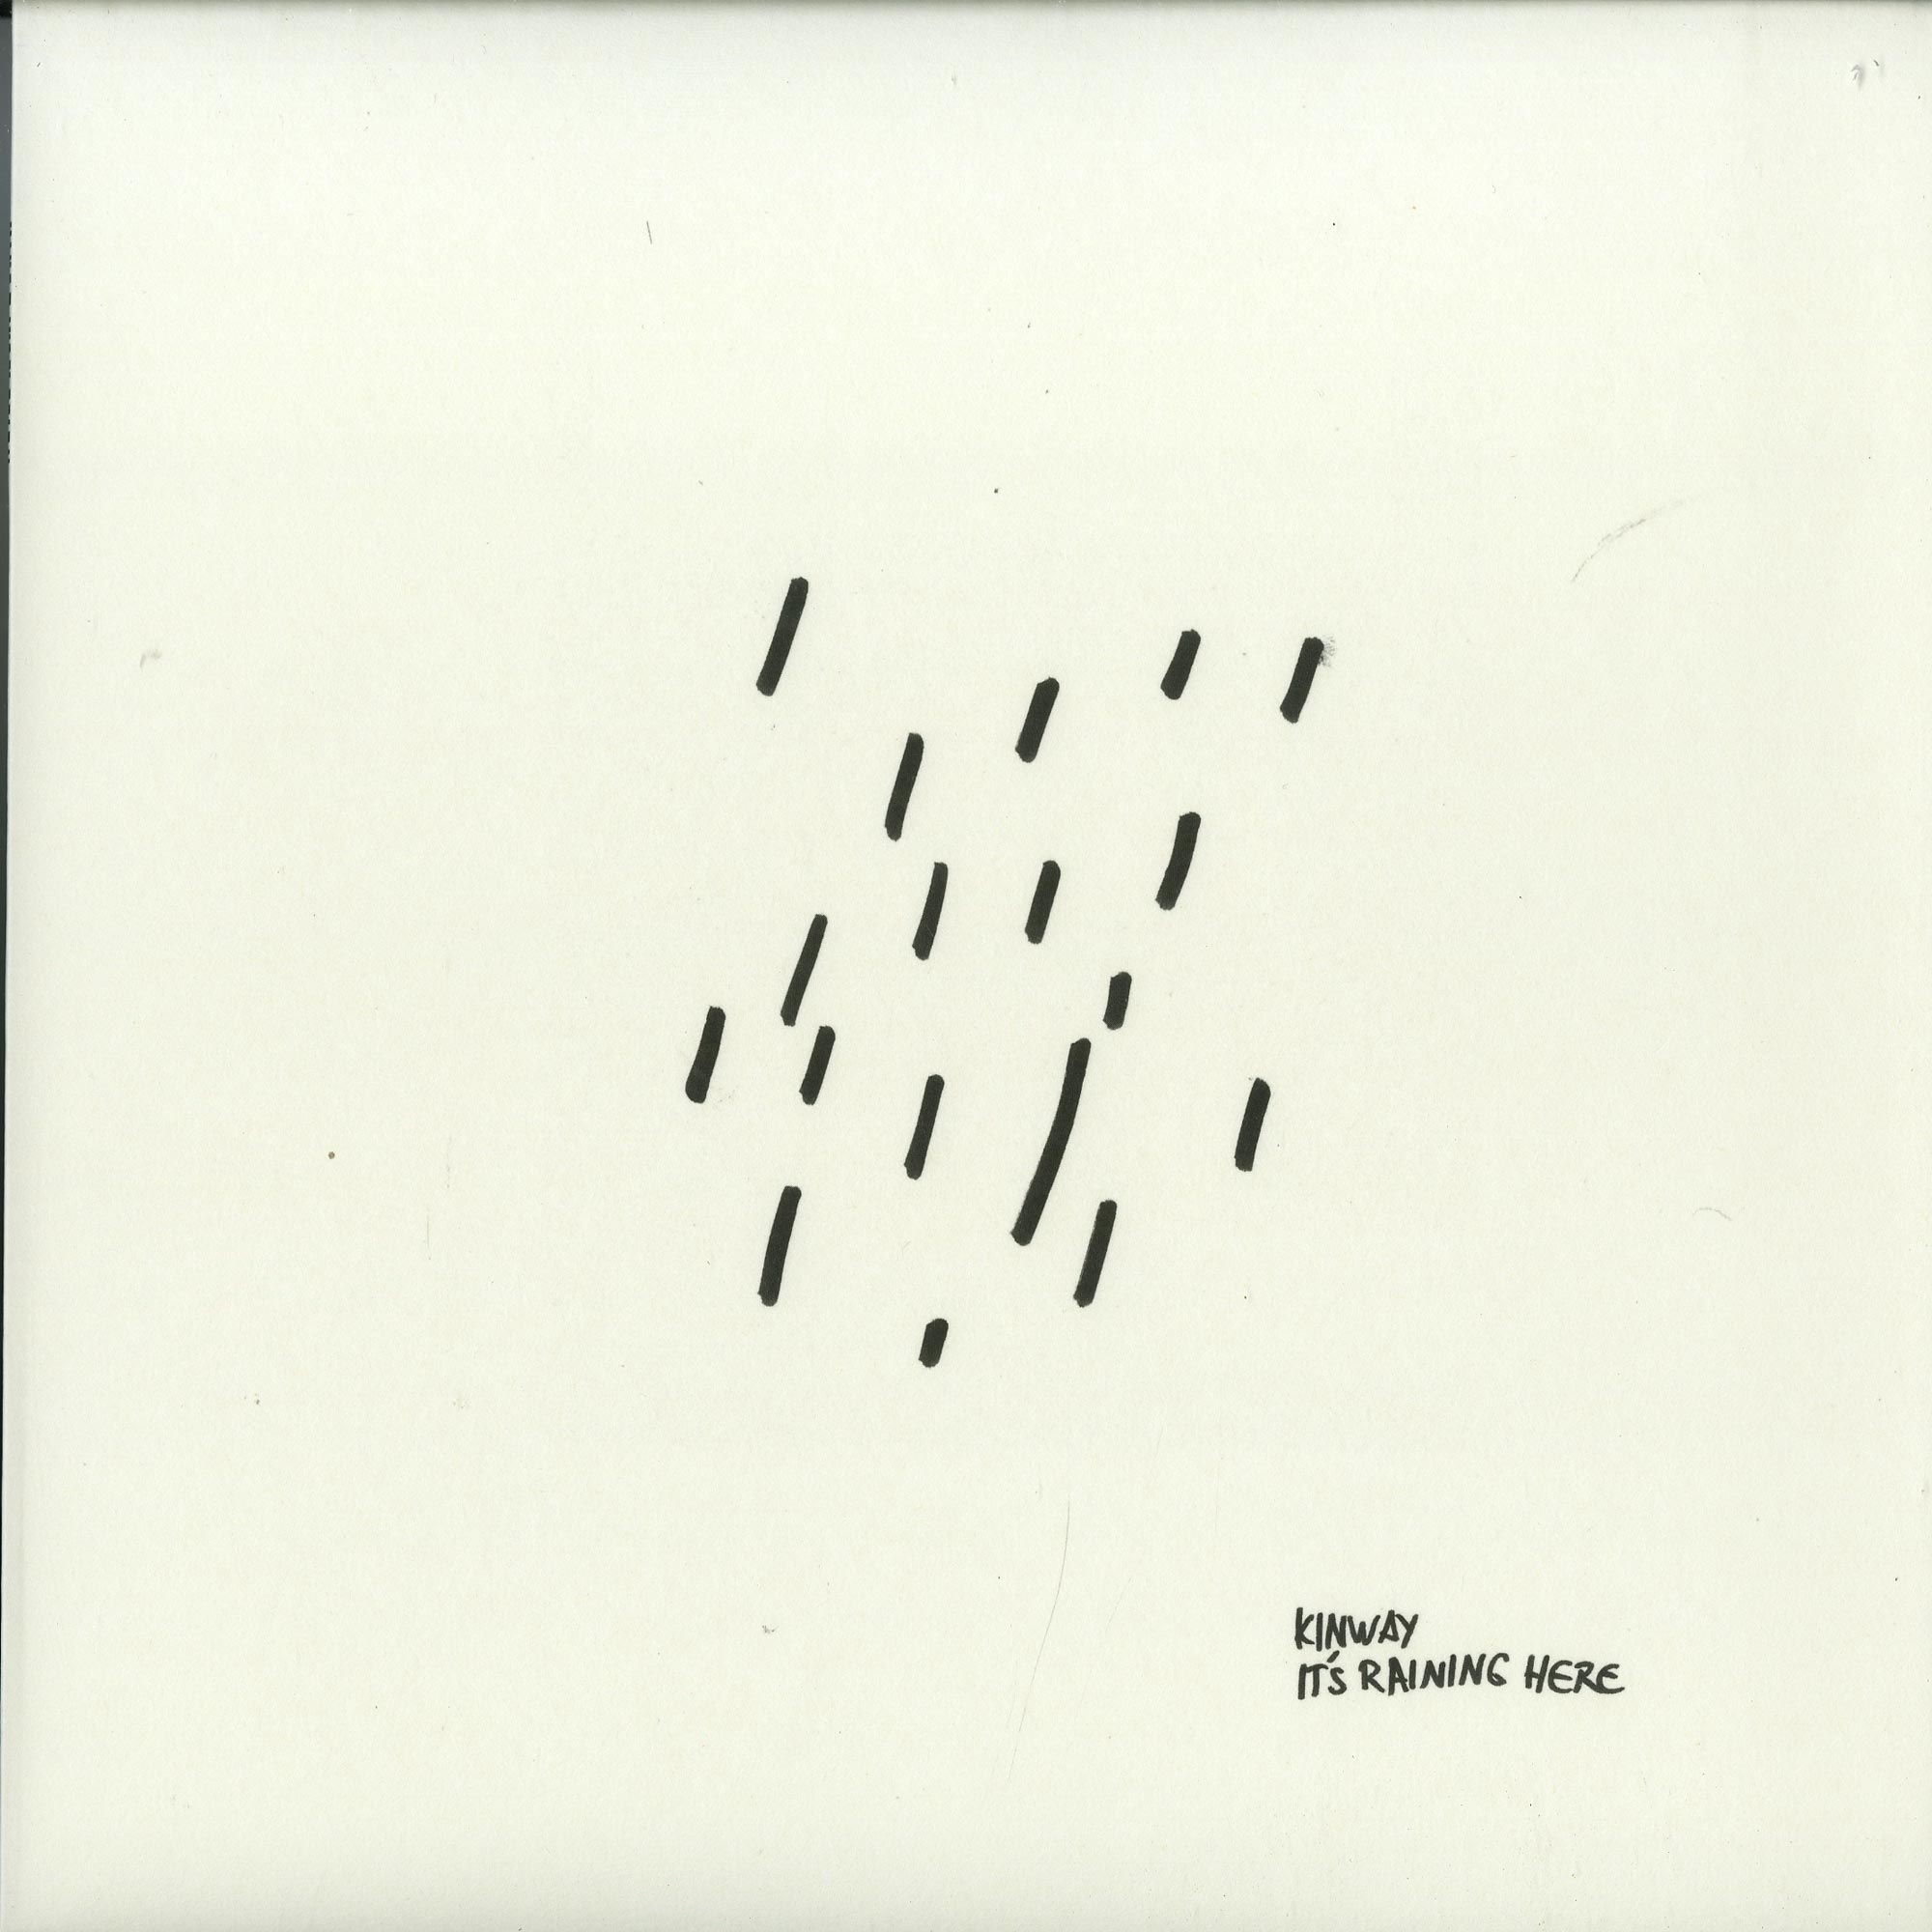 Kinway - IT S RAINING HERE